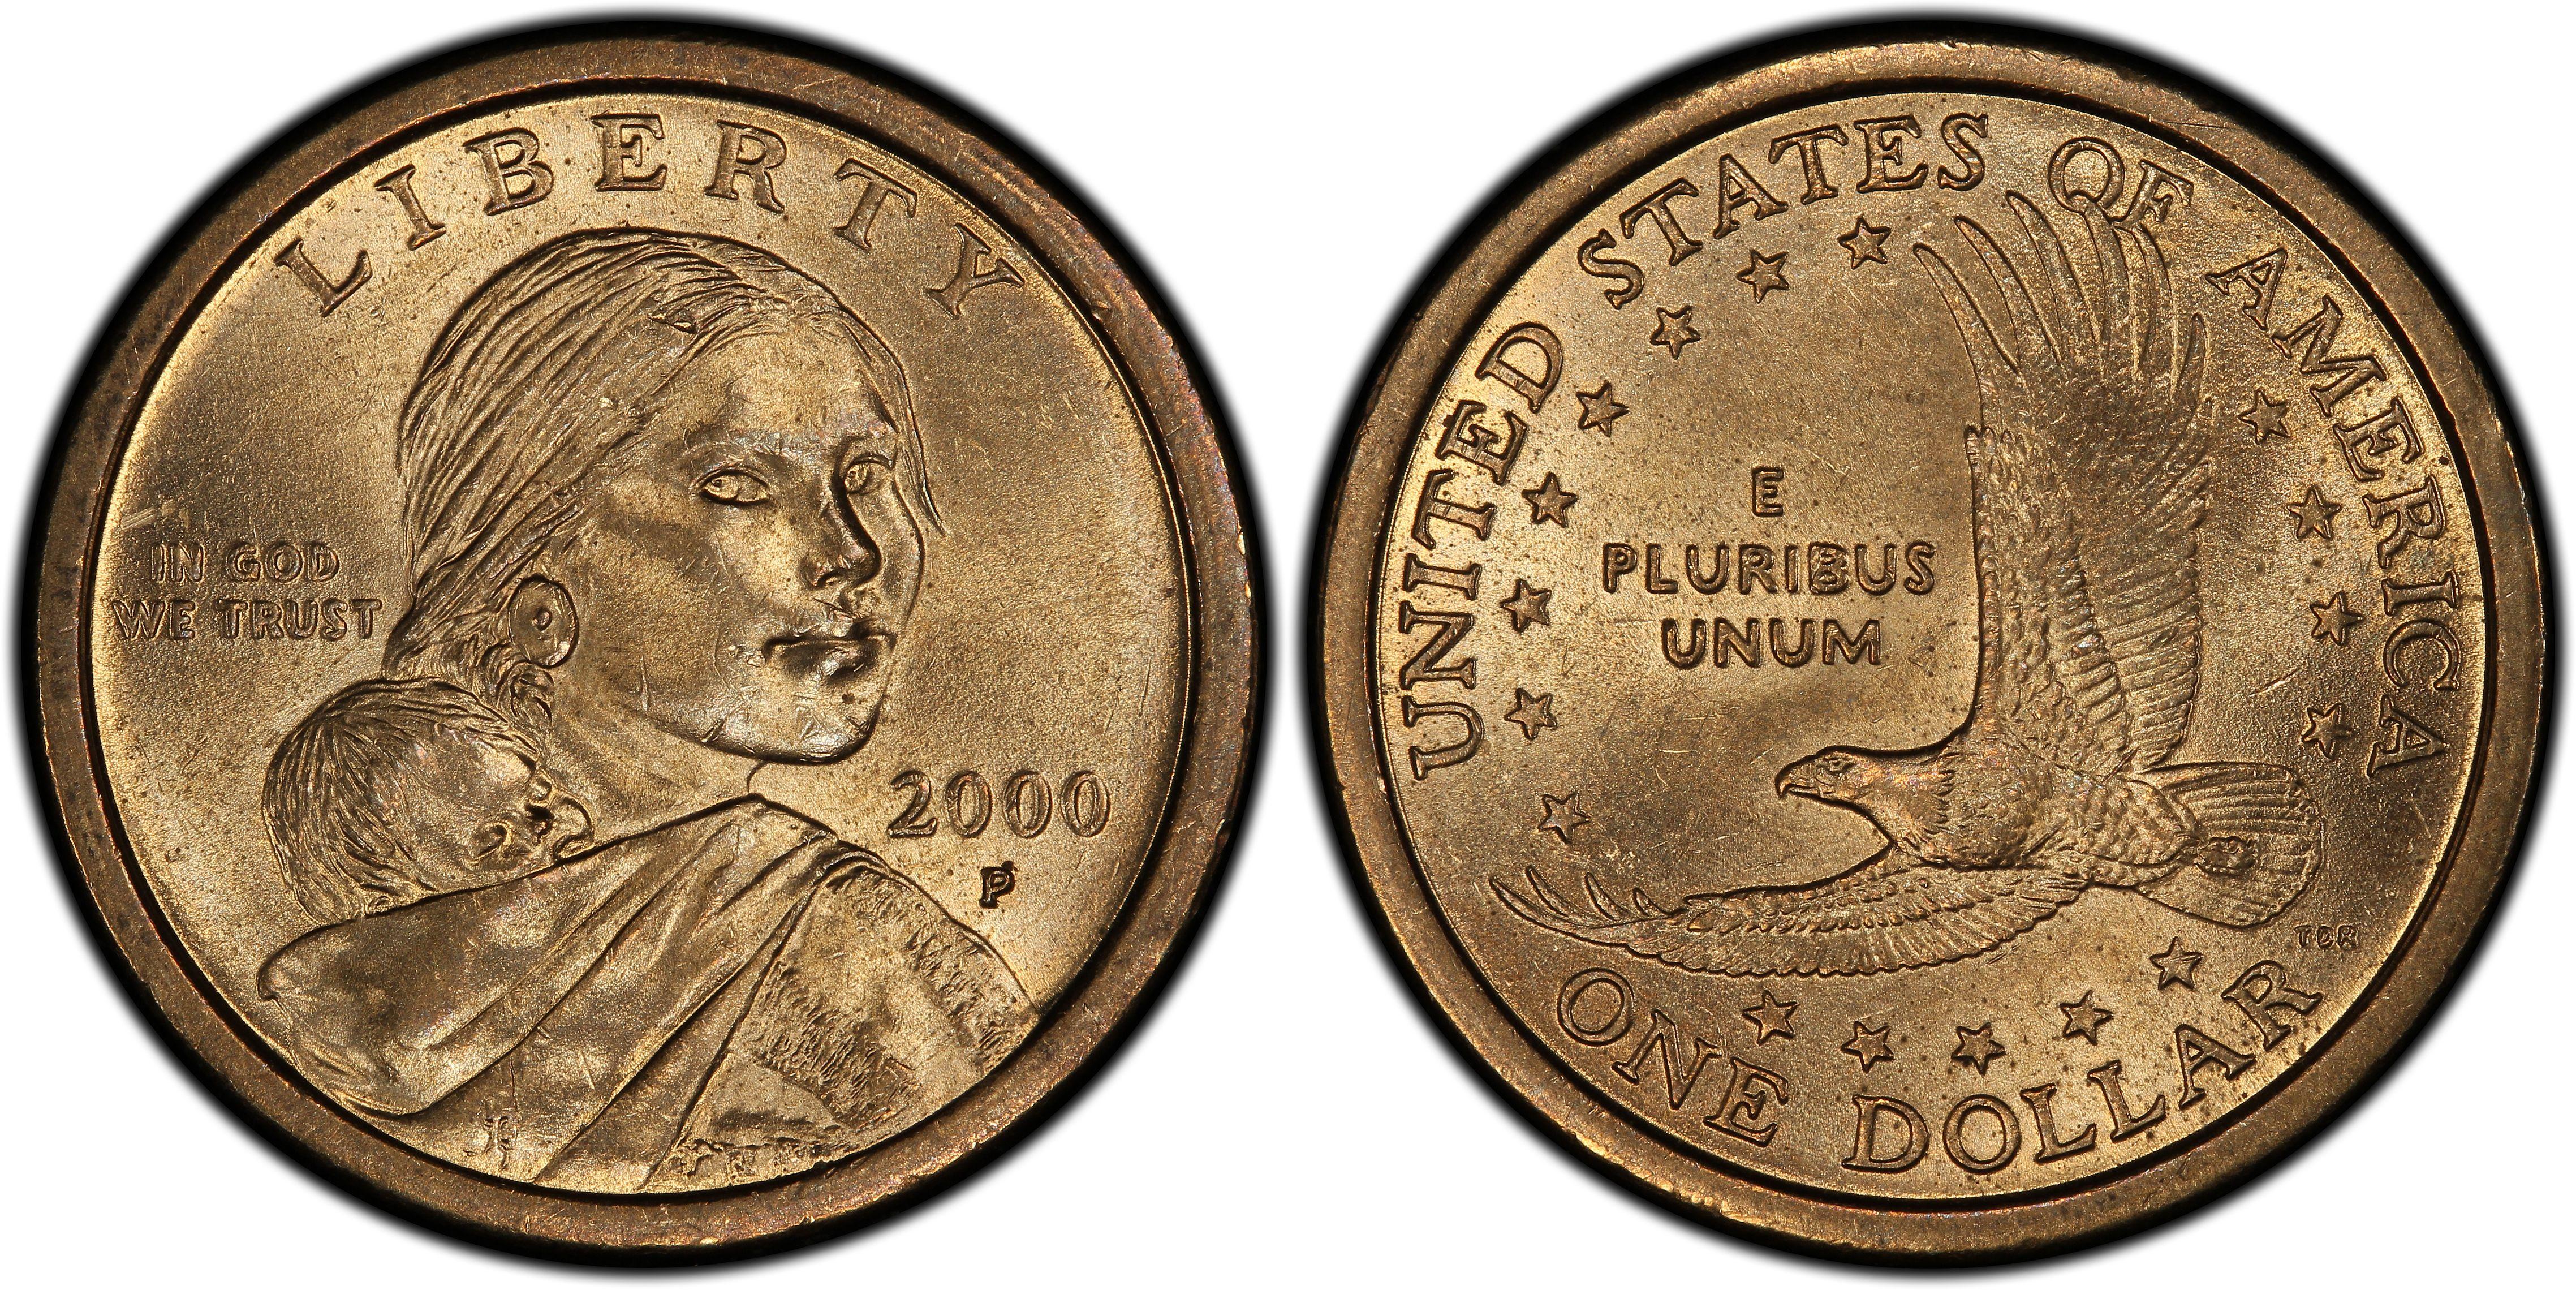 sacagawea coin 2000 p wounded eagle